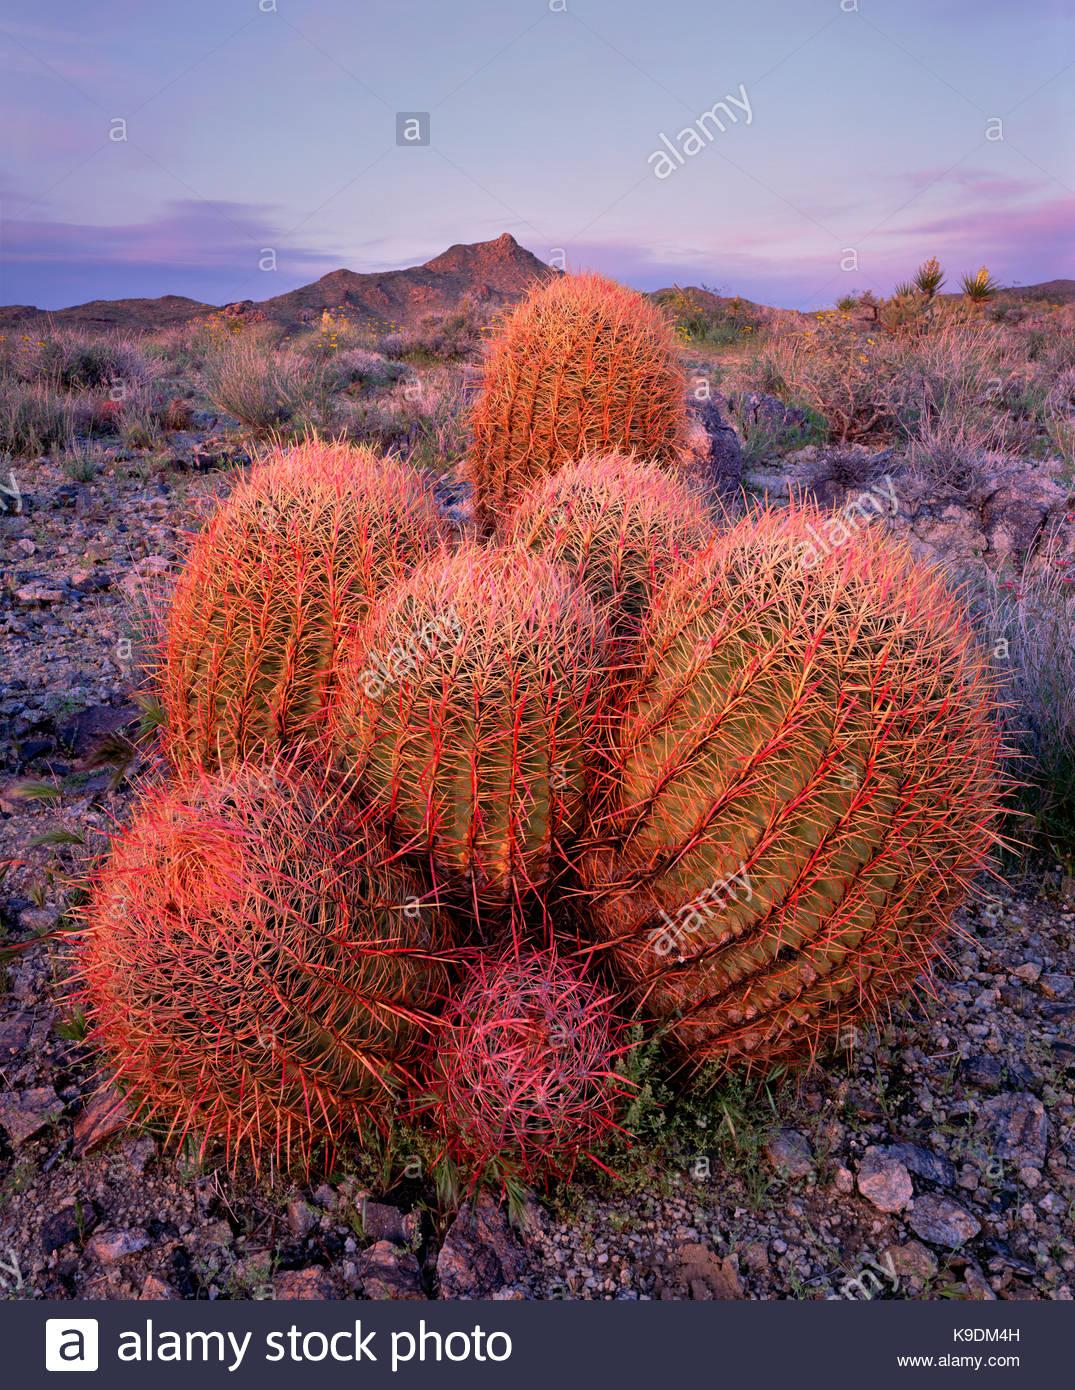 Barrel Cactus Grouping at last Light, Mojave National Preserve, California - Stock Image